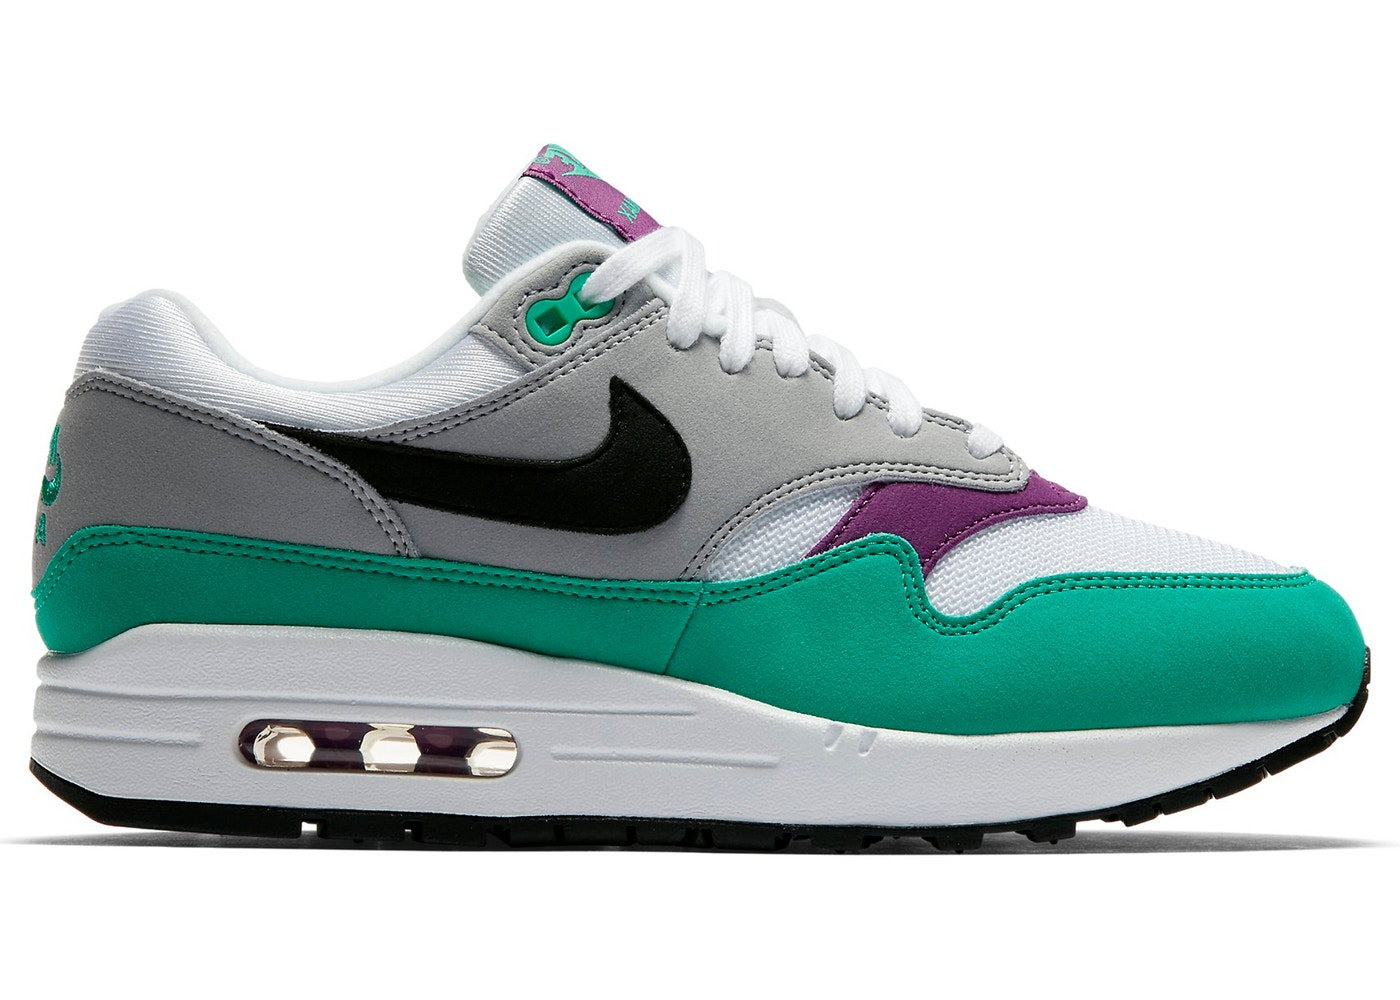 9e8043bf5728 Nike Air Max 1 Shoes - Volatility